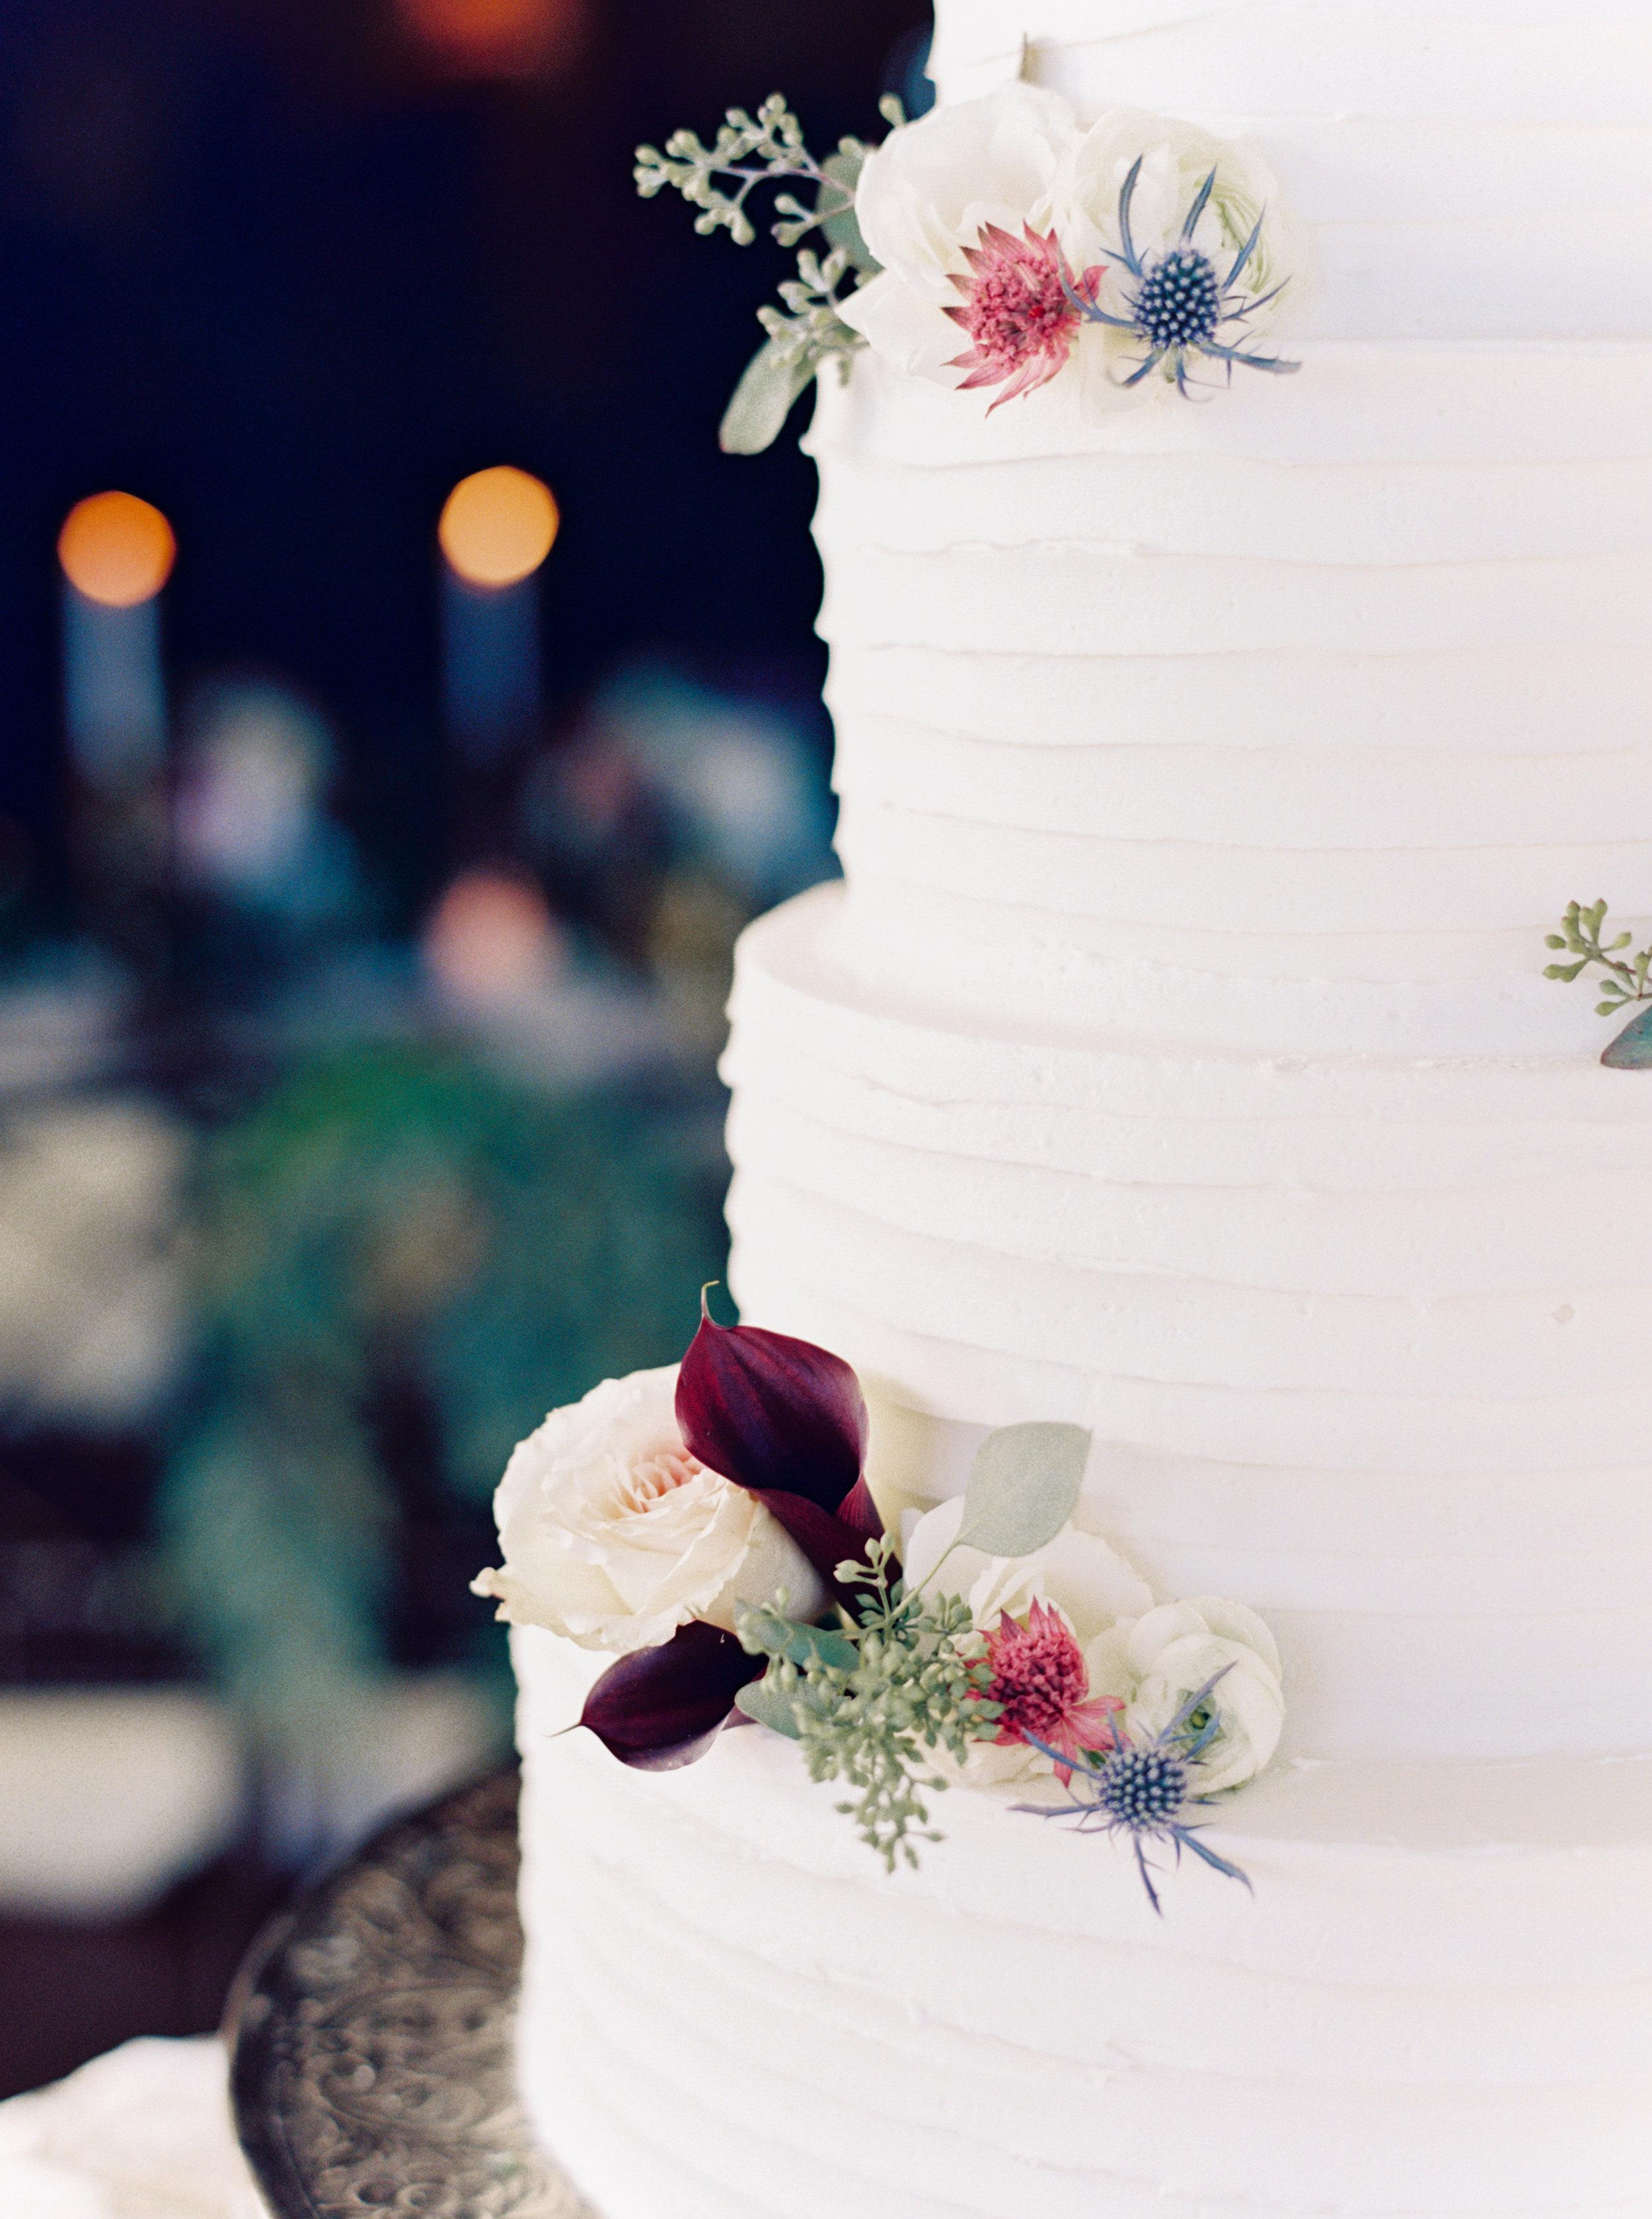 Congressional-Country-Club-wedding-Bathesda-Maryland-wedding-photographer-Richmond-natalie-jayne-photography-image-04-3.jpg